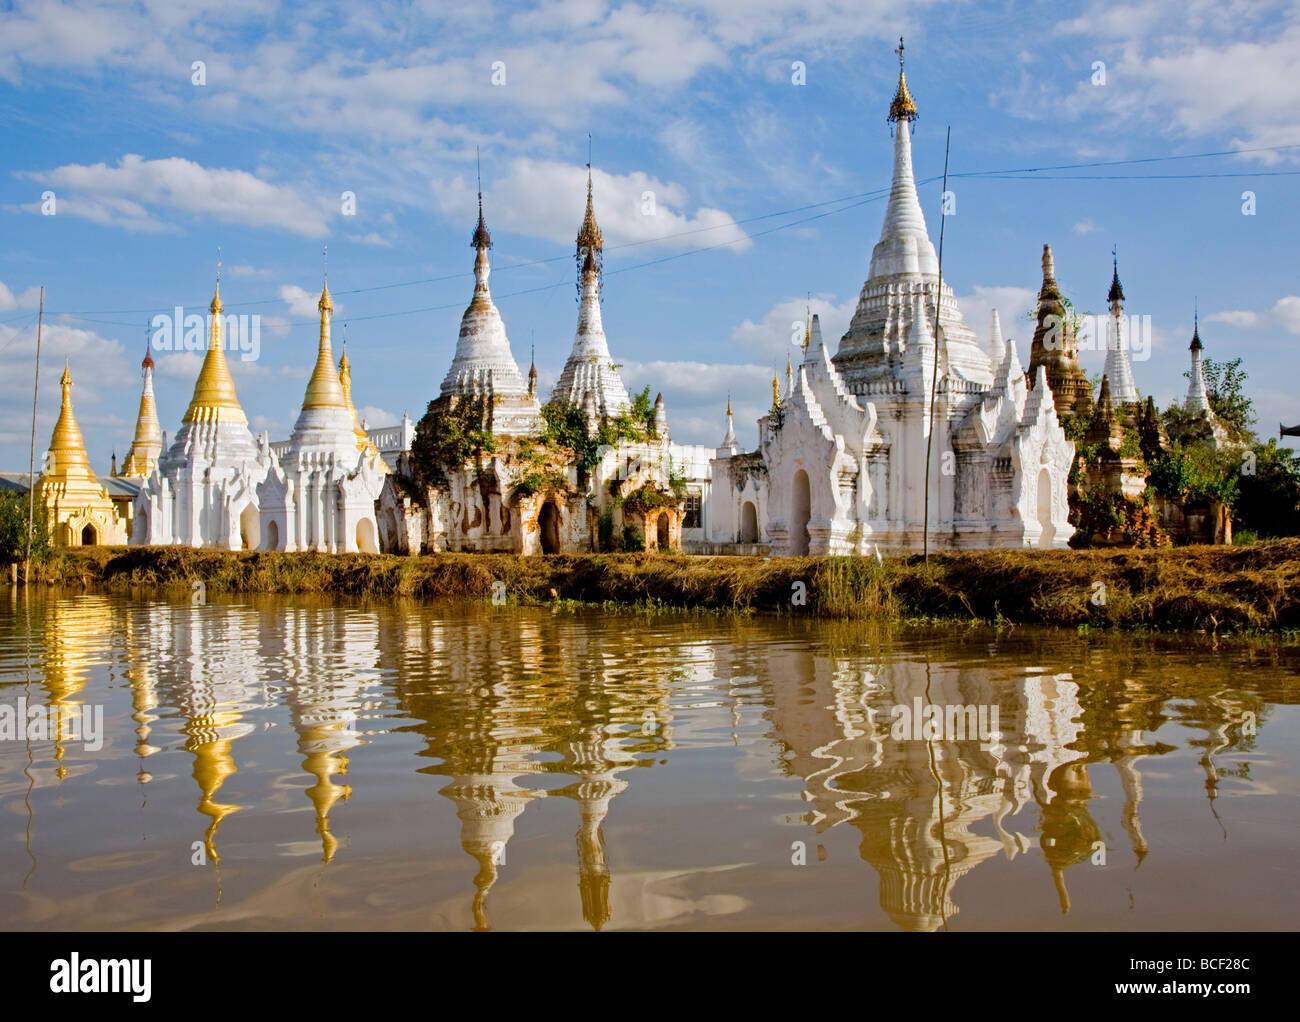 Myanmar, Burma, Lake Inle. Buddhist shrines reflected in the waters of Lake Inle. - Stock Image